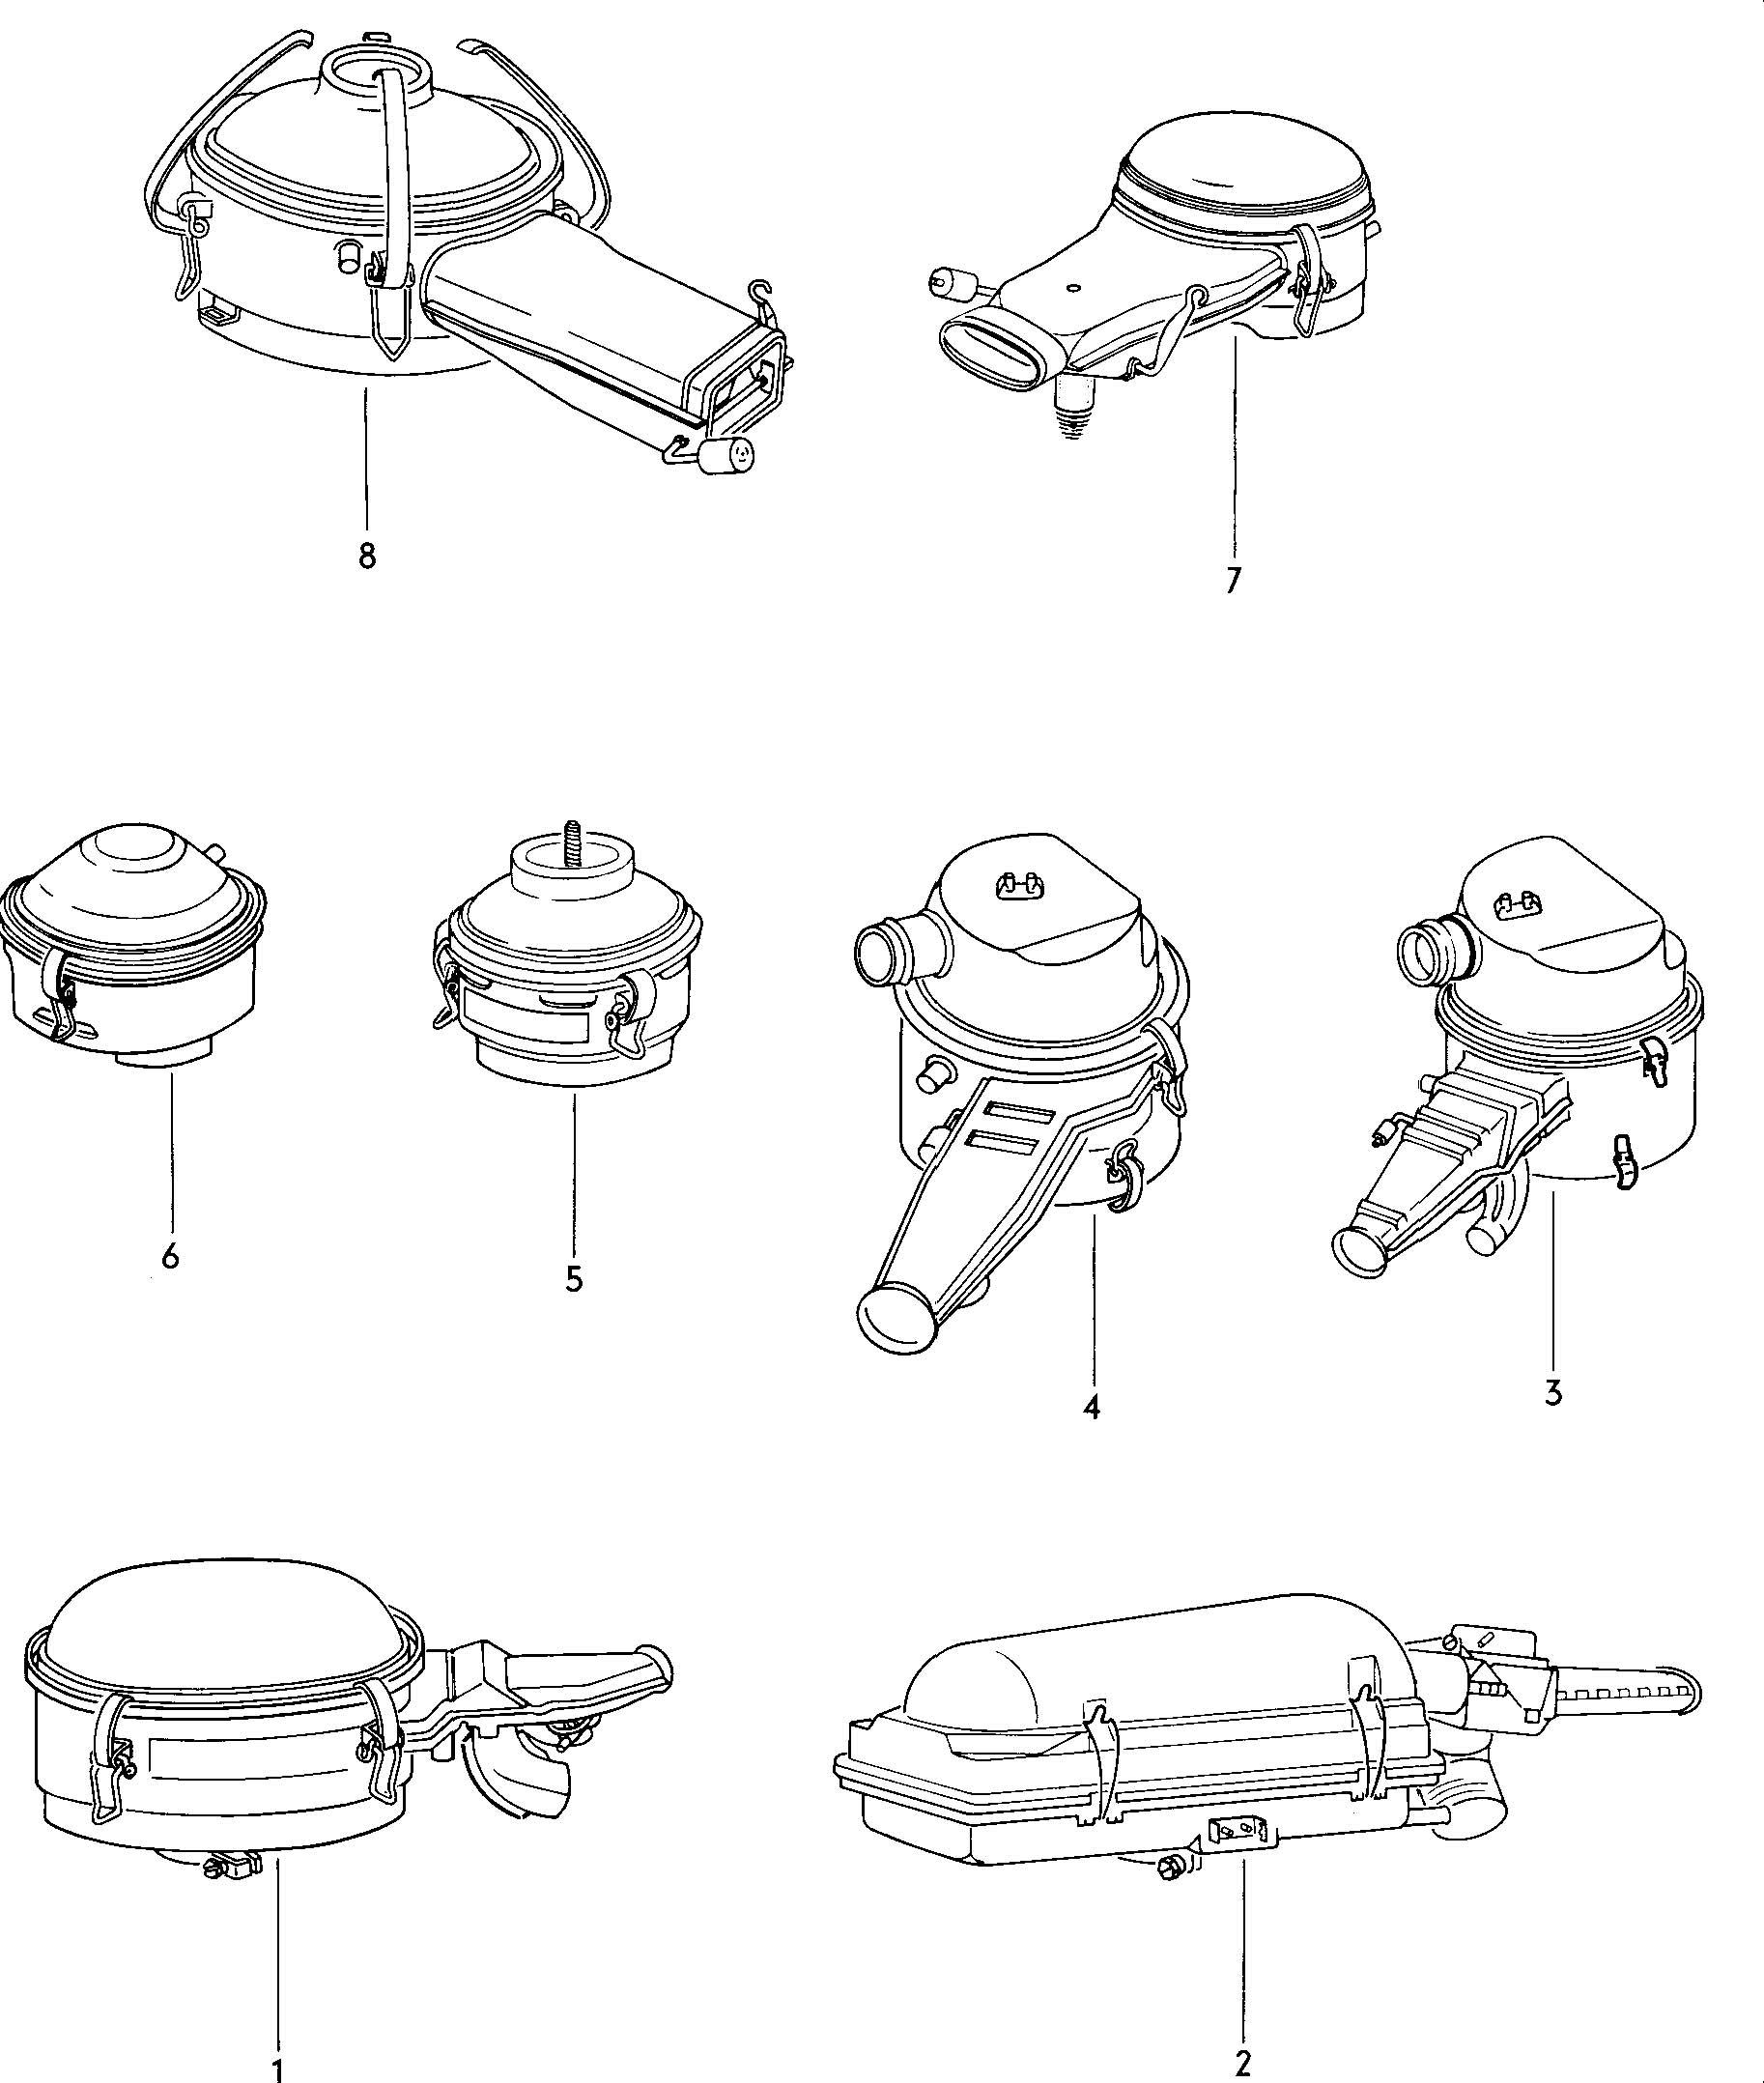 1965 volkswagen beetle air cleaner